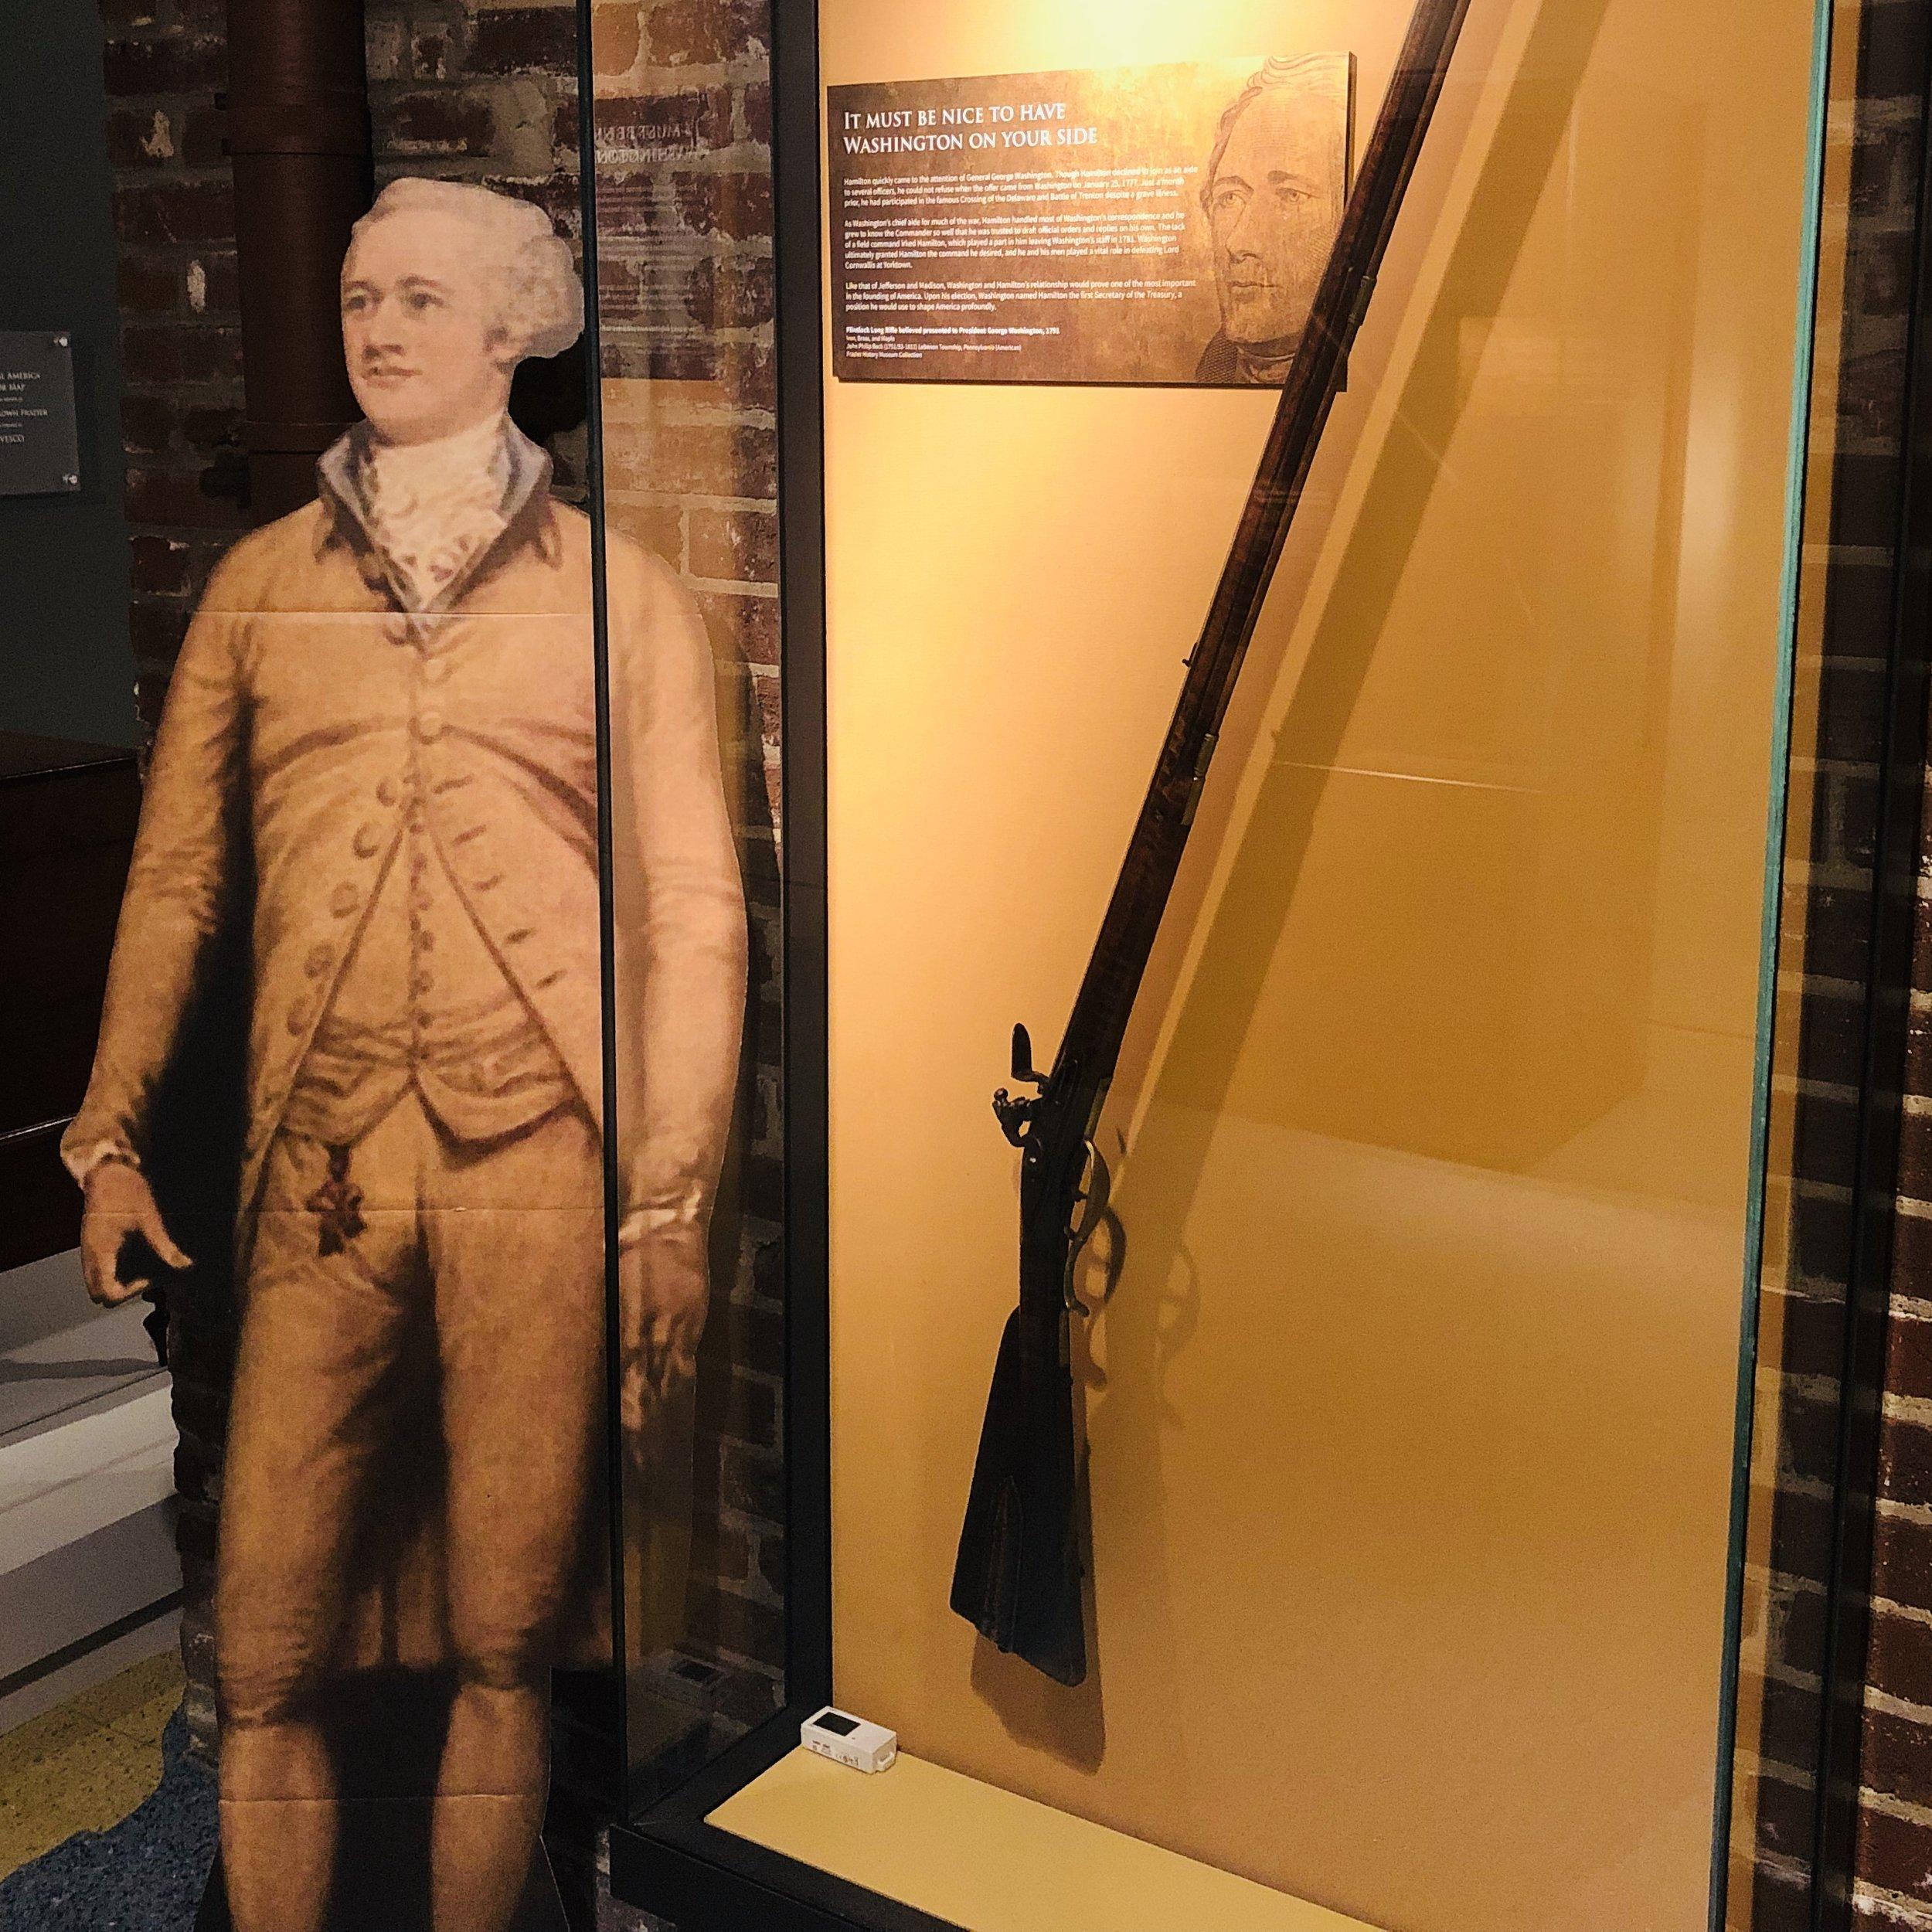 washingtons rifle.jpg